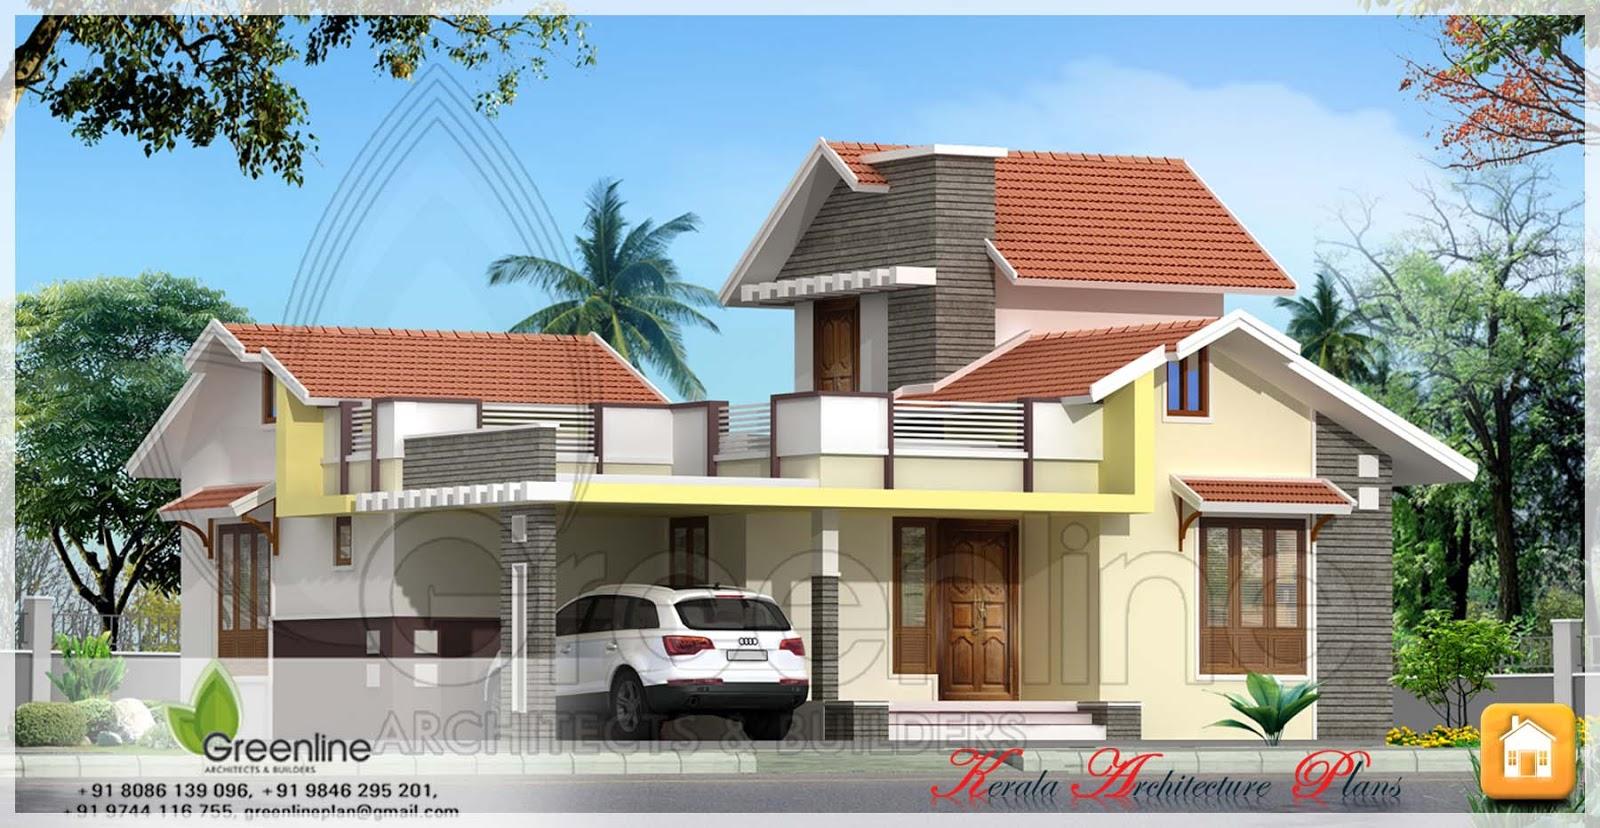 Single storied kerala house plan in 1250 square feet for Single storied kerala house plans